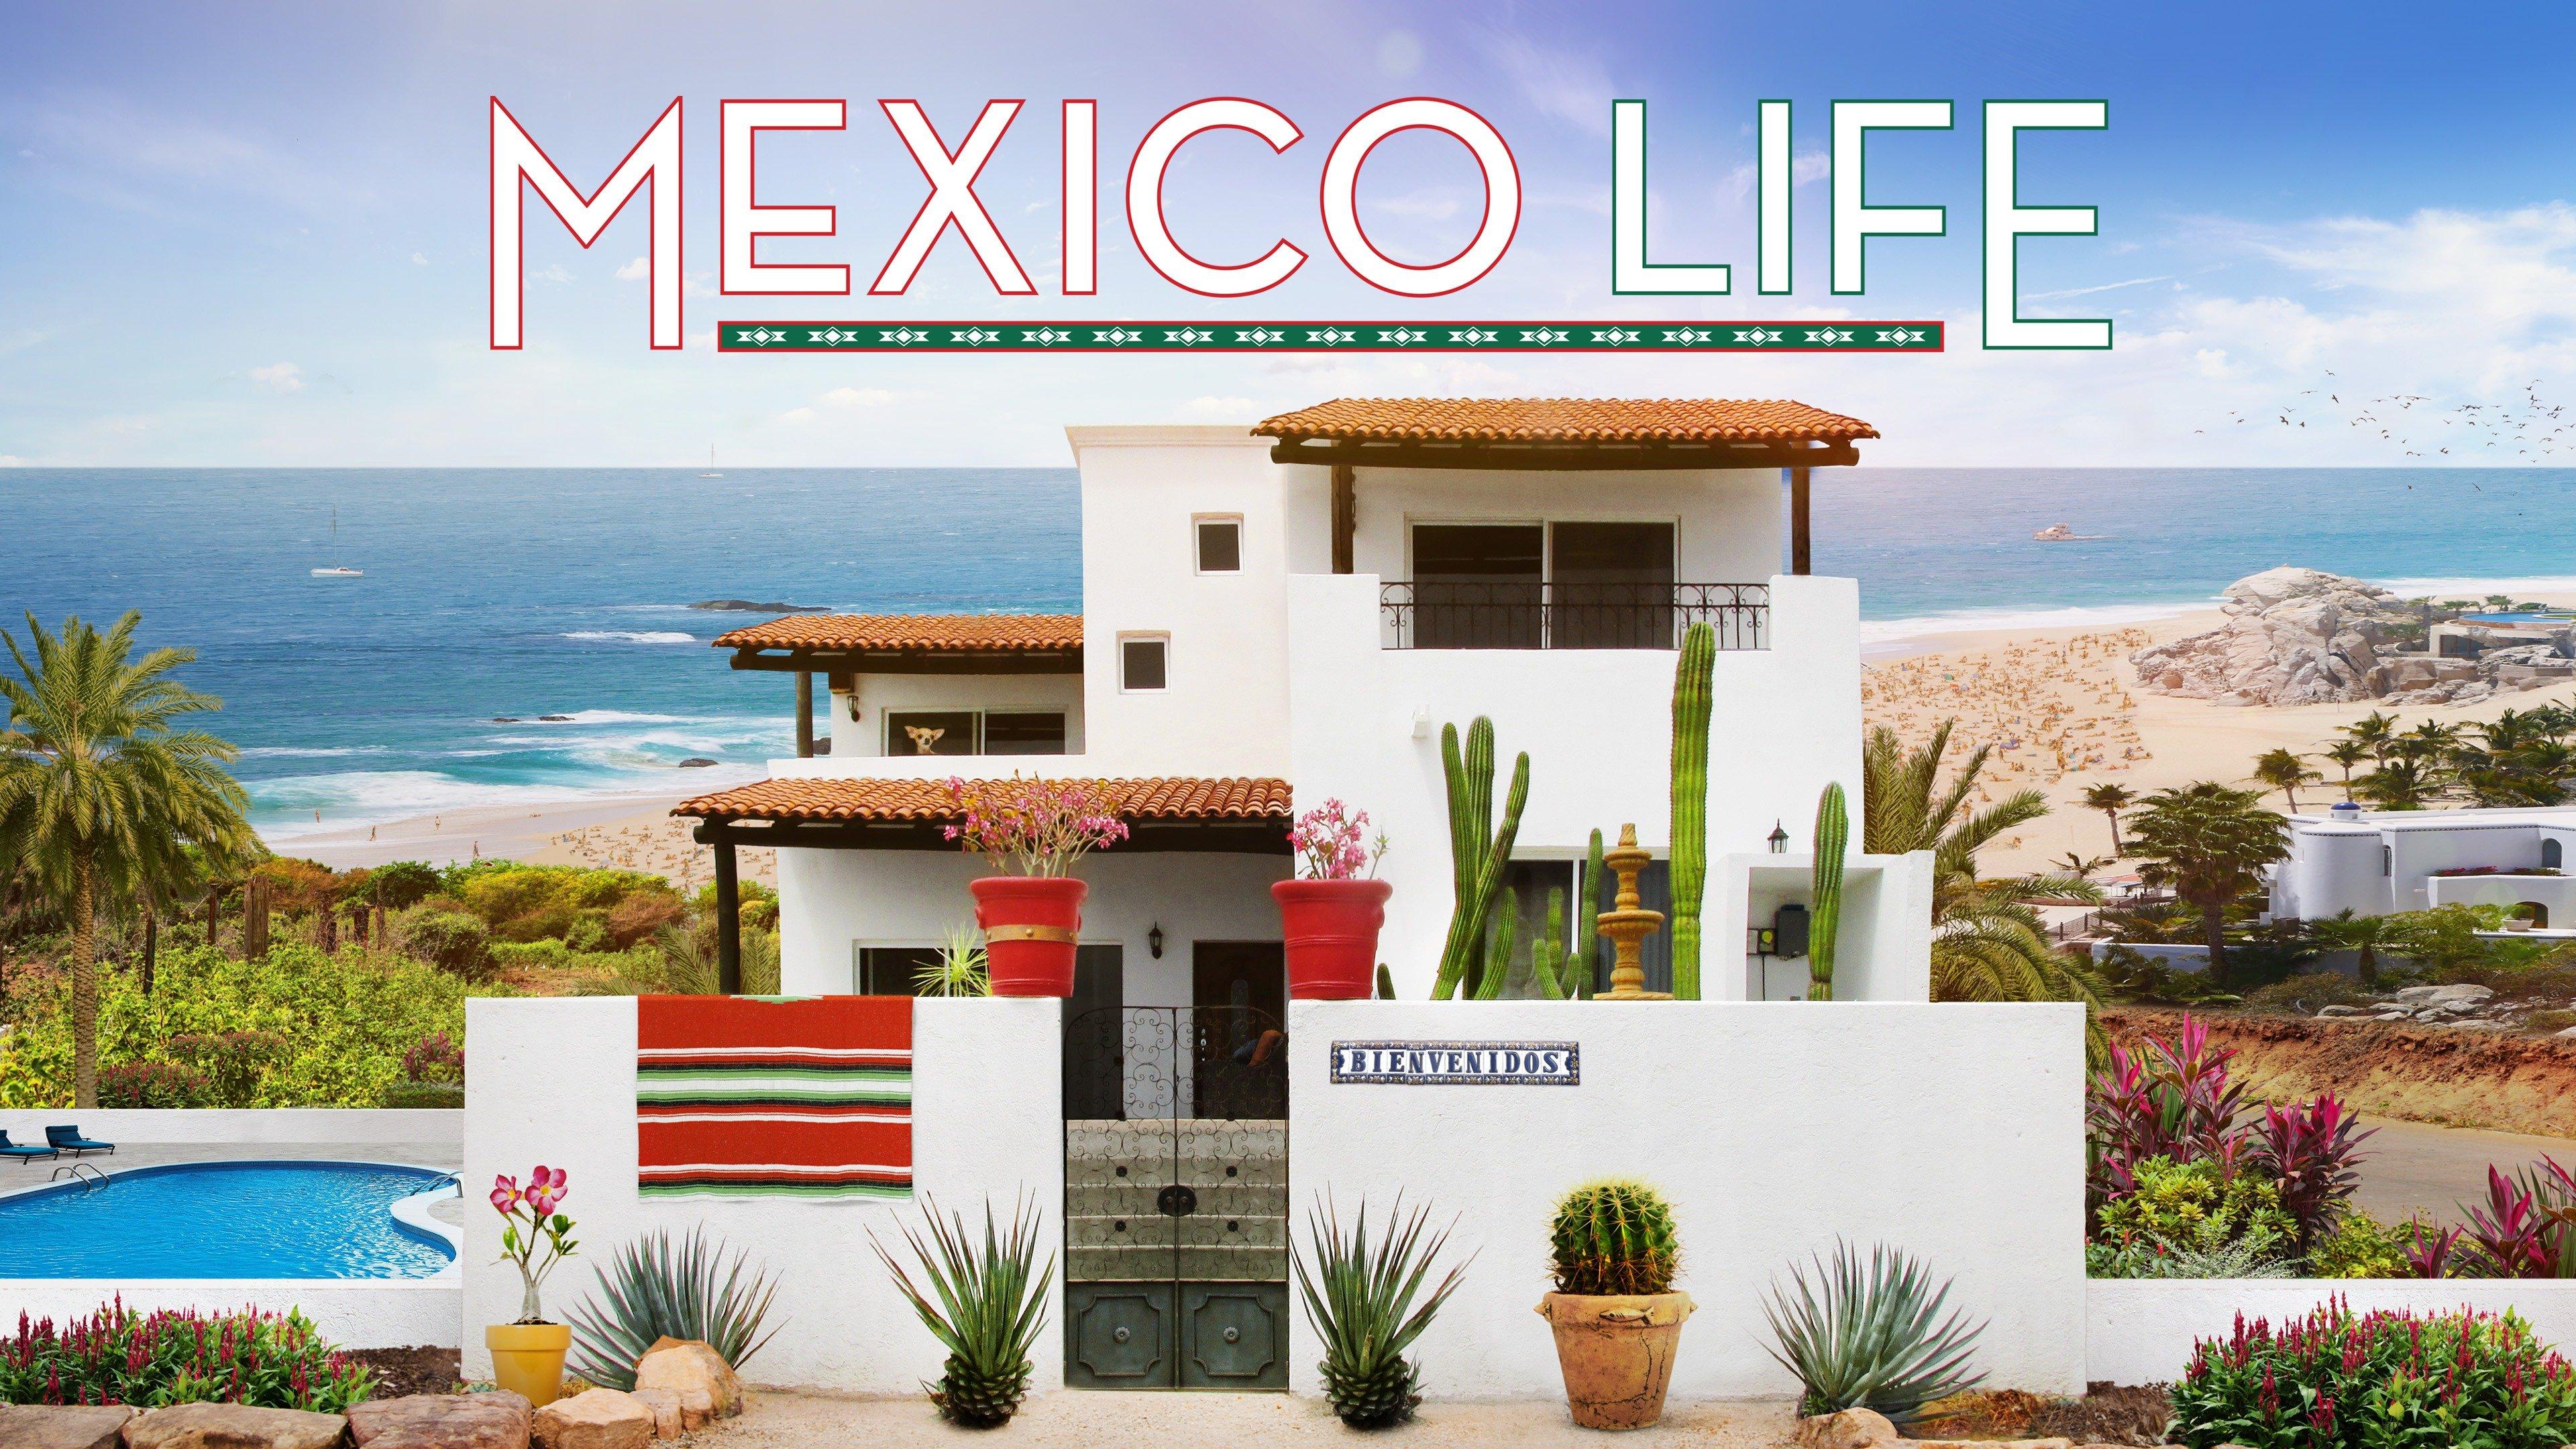 Mexico Life